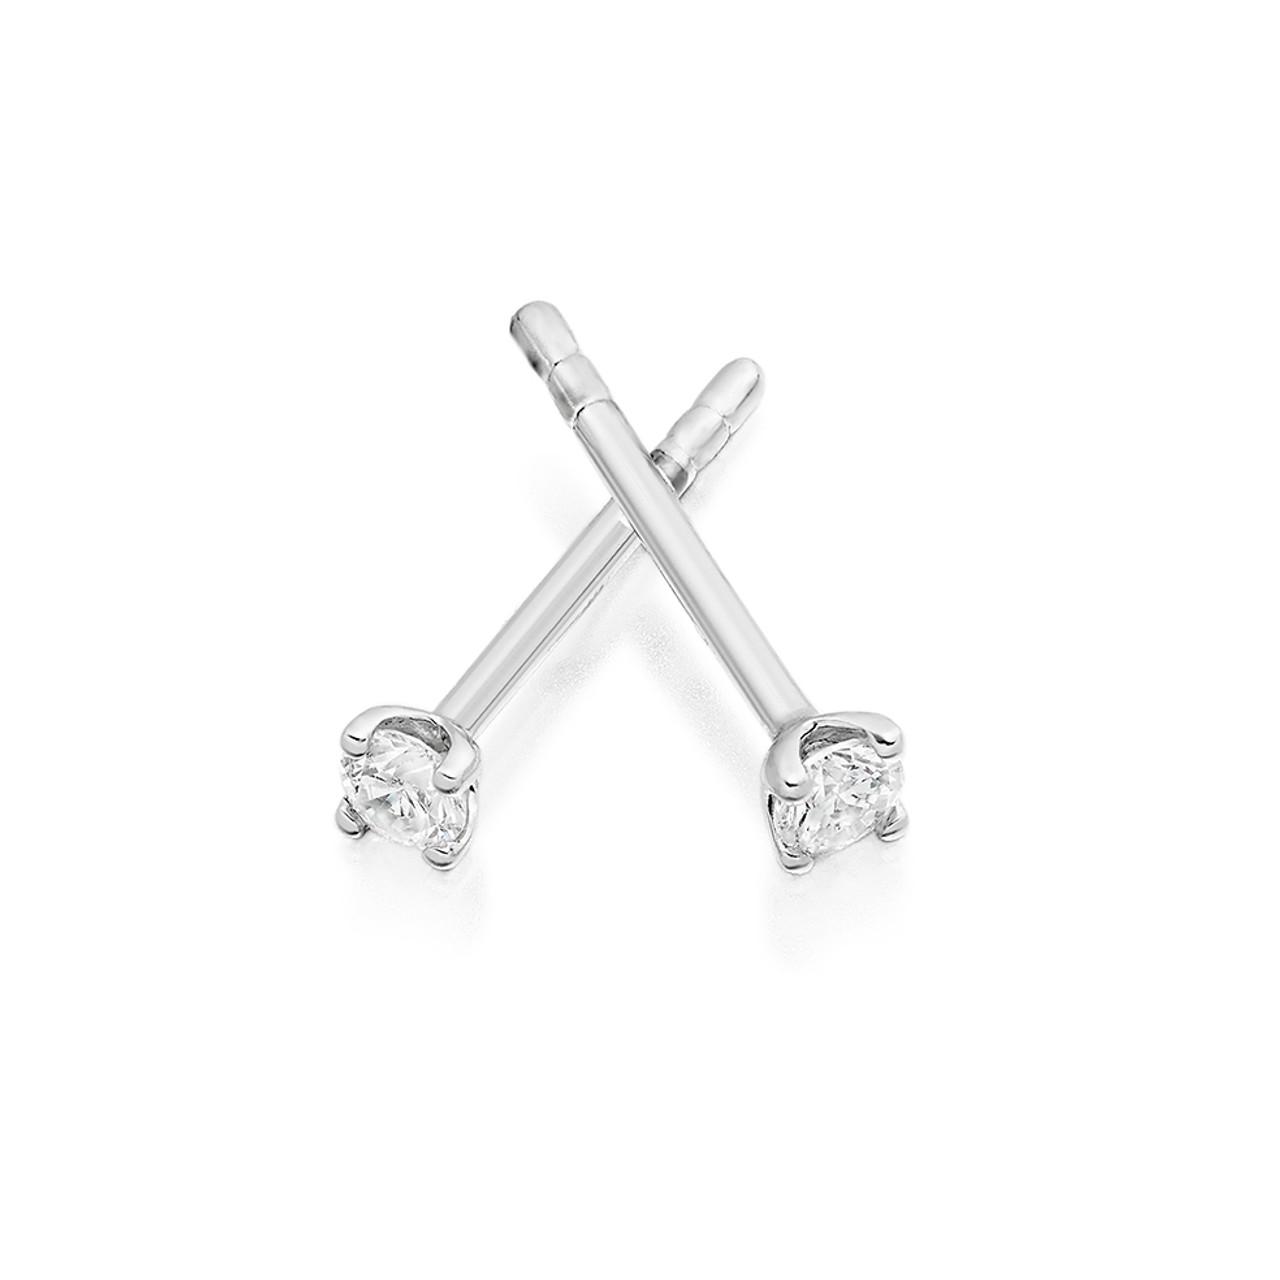 18ct White Gold 0.10ct Diamond Stud Earrings